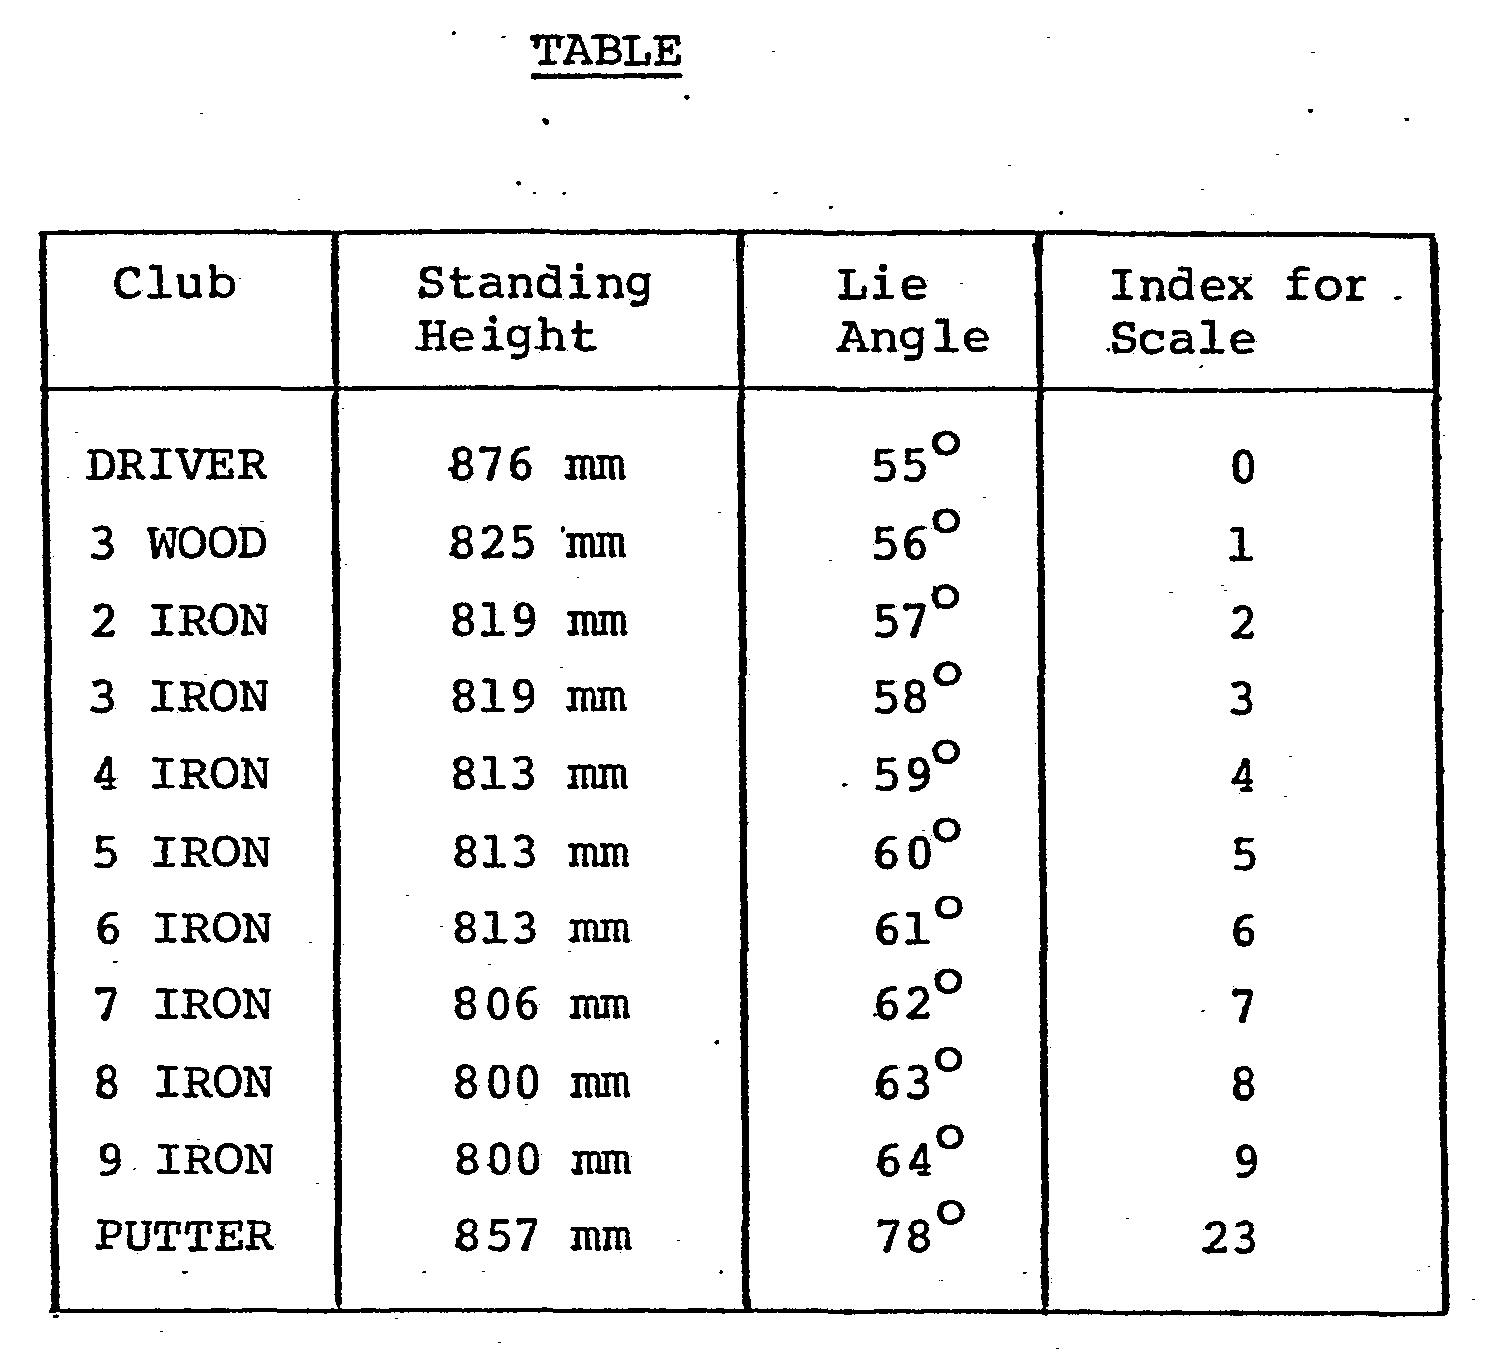 golf club lie angle adjustment machine